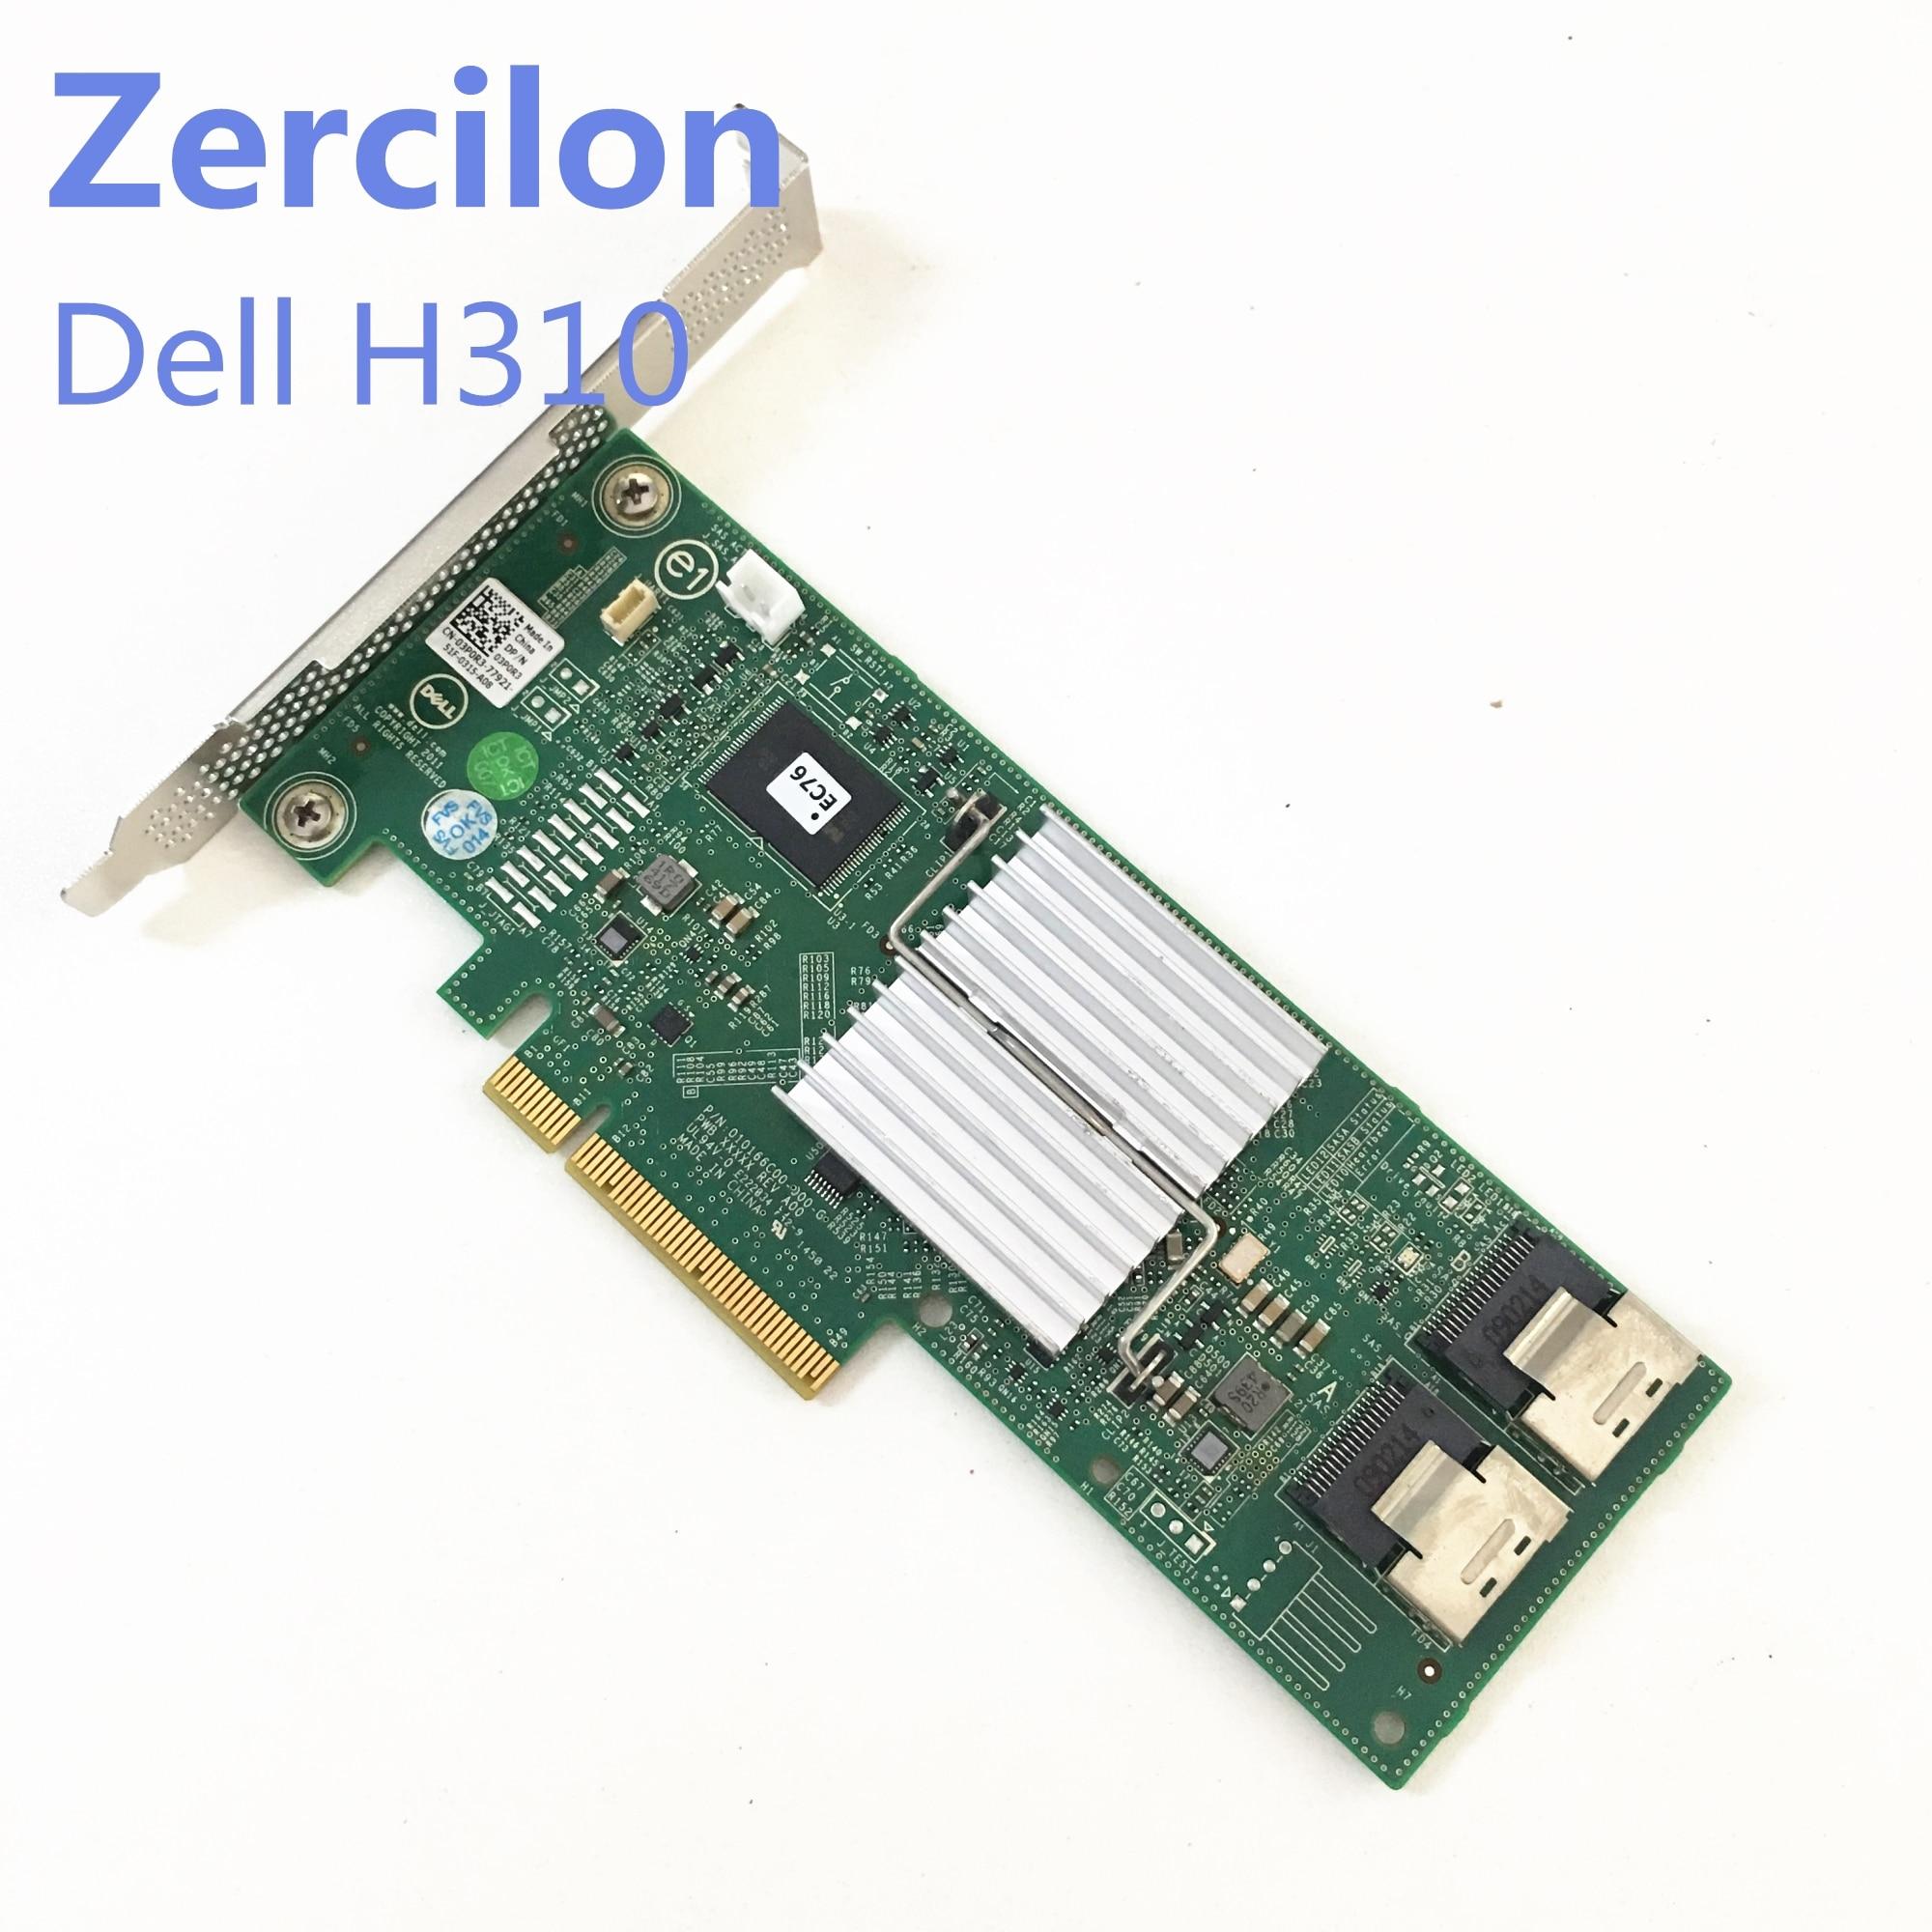 Used Original Dell Perc H310 SATA / SAS HBA Controller RAID 6Gbps PCIe X8 LSI 9240-8i M1015 P20 IT MODE